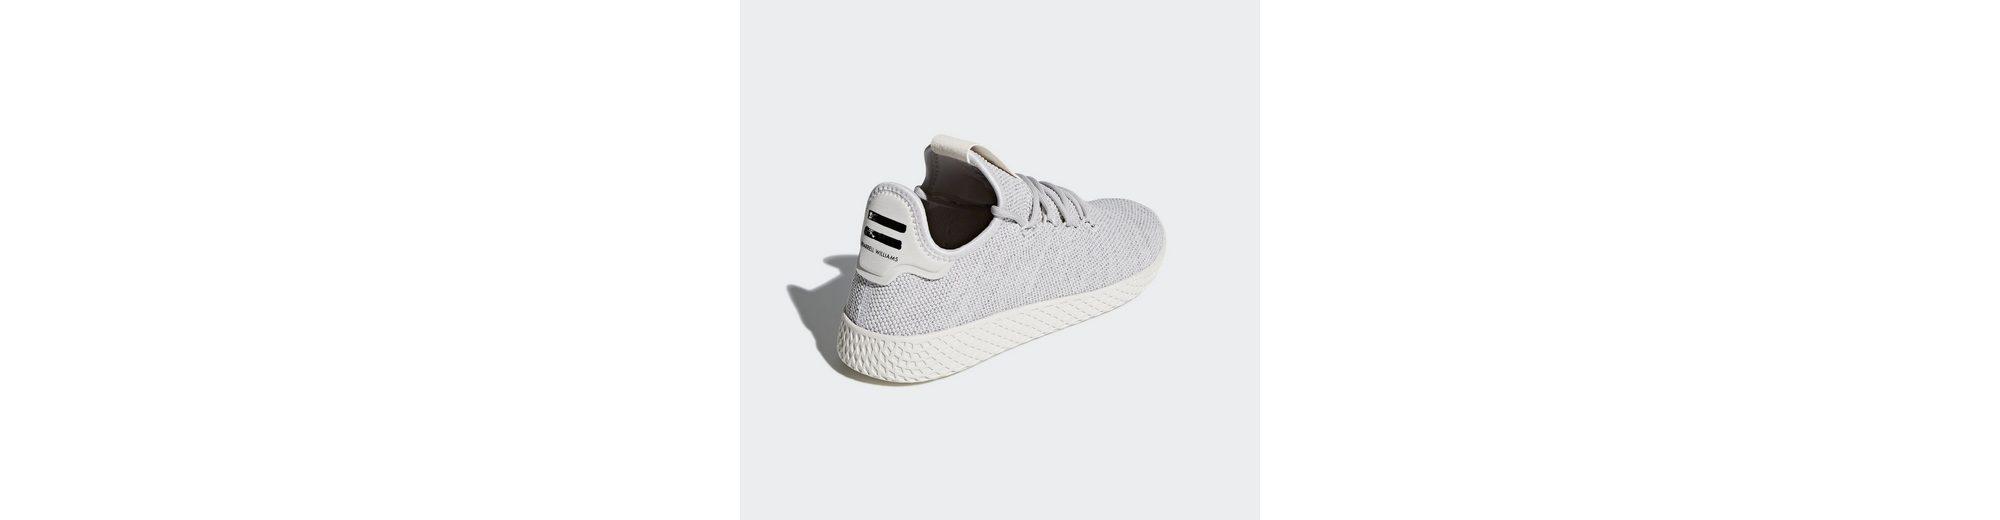 adidas Originals Pharrell Williams Tennis HU Schuh Sneaker Spielraum Großer Verkauf sJxJSKDbS